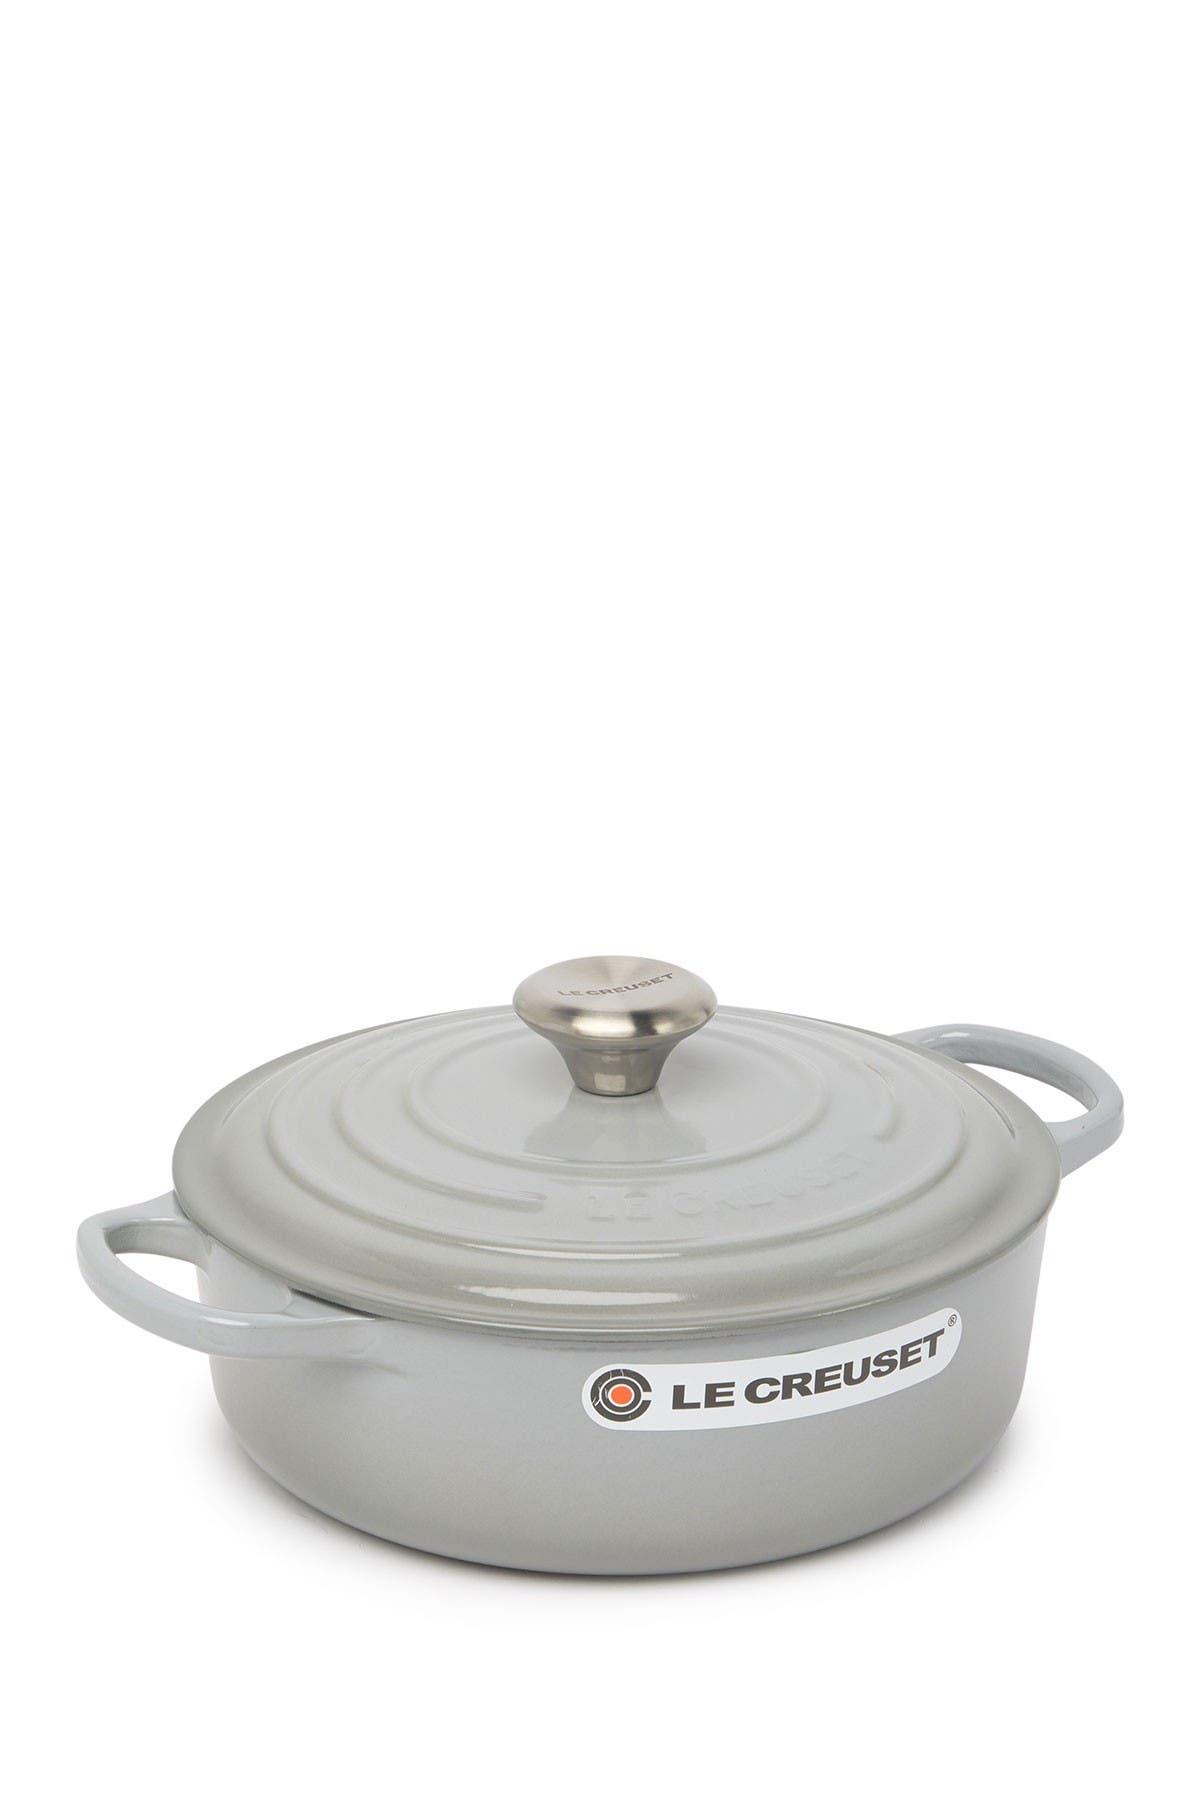 Image of Le Creuset Round Wide Dutch Oven - 3.5 Quart